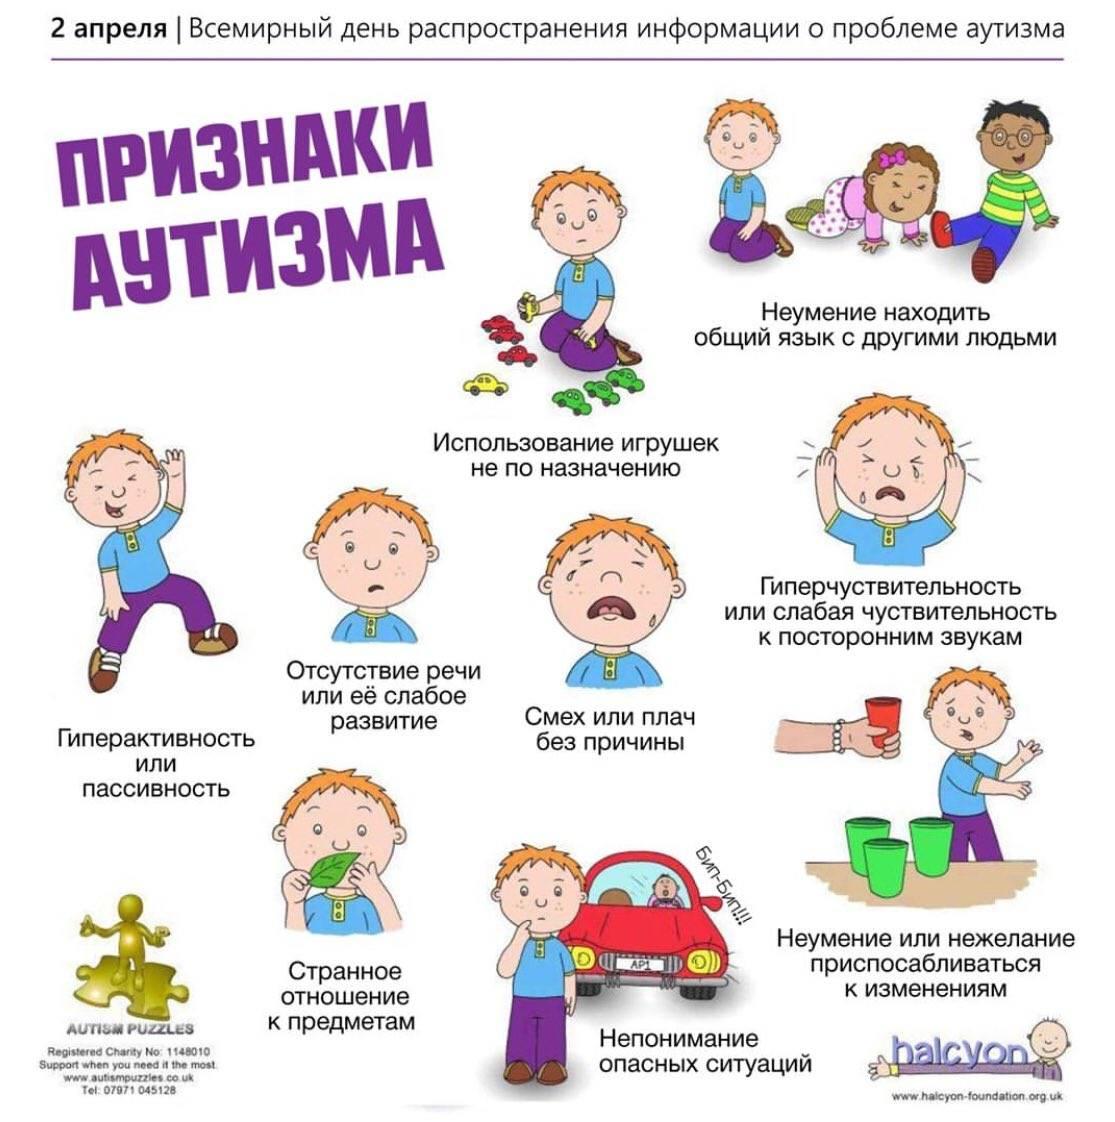 синдром аутиста